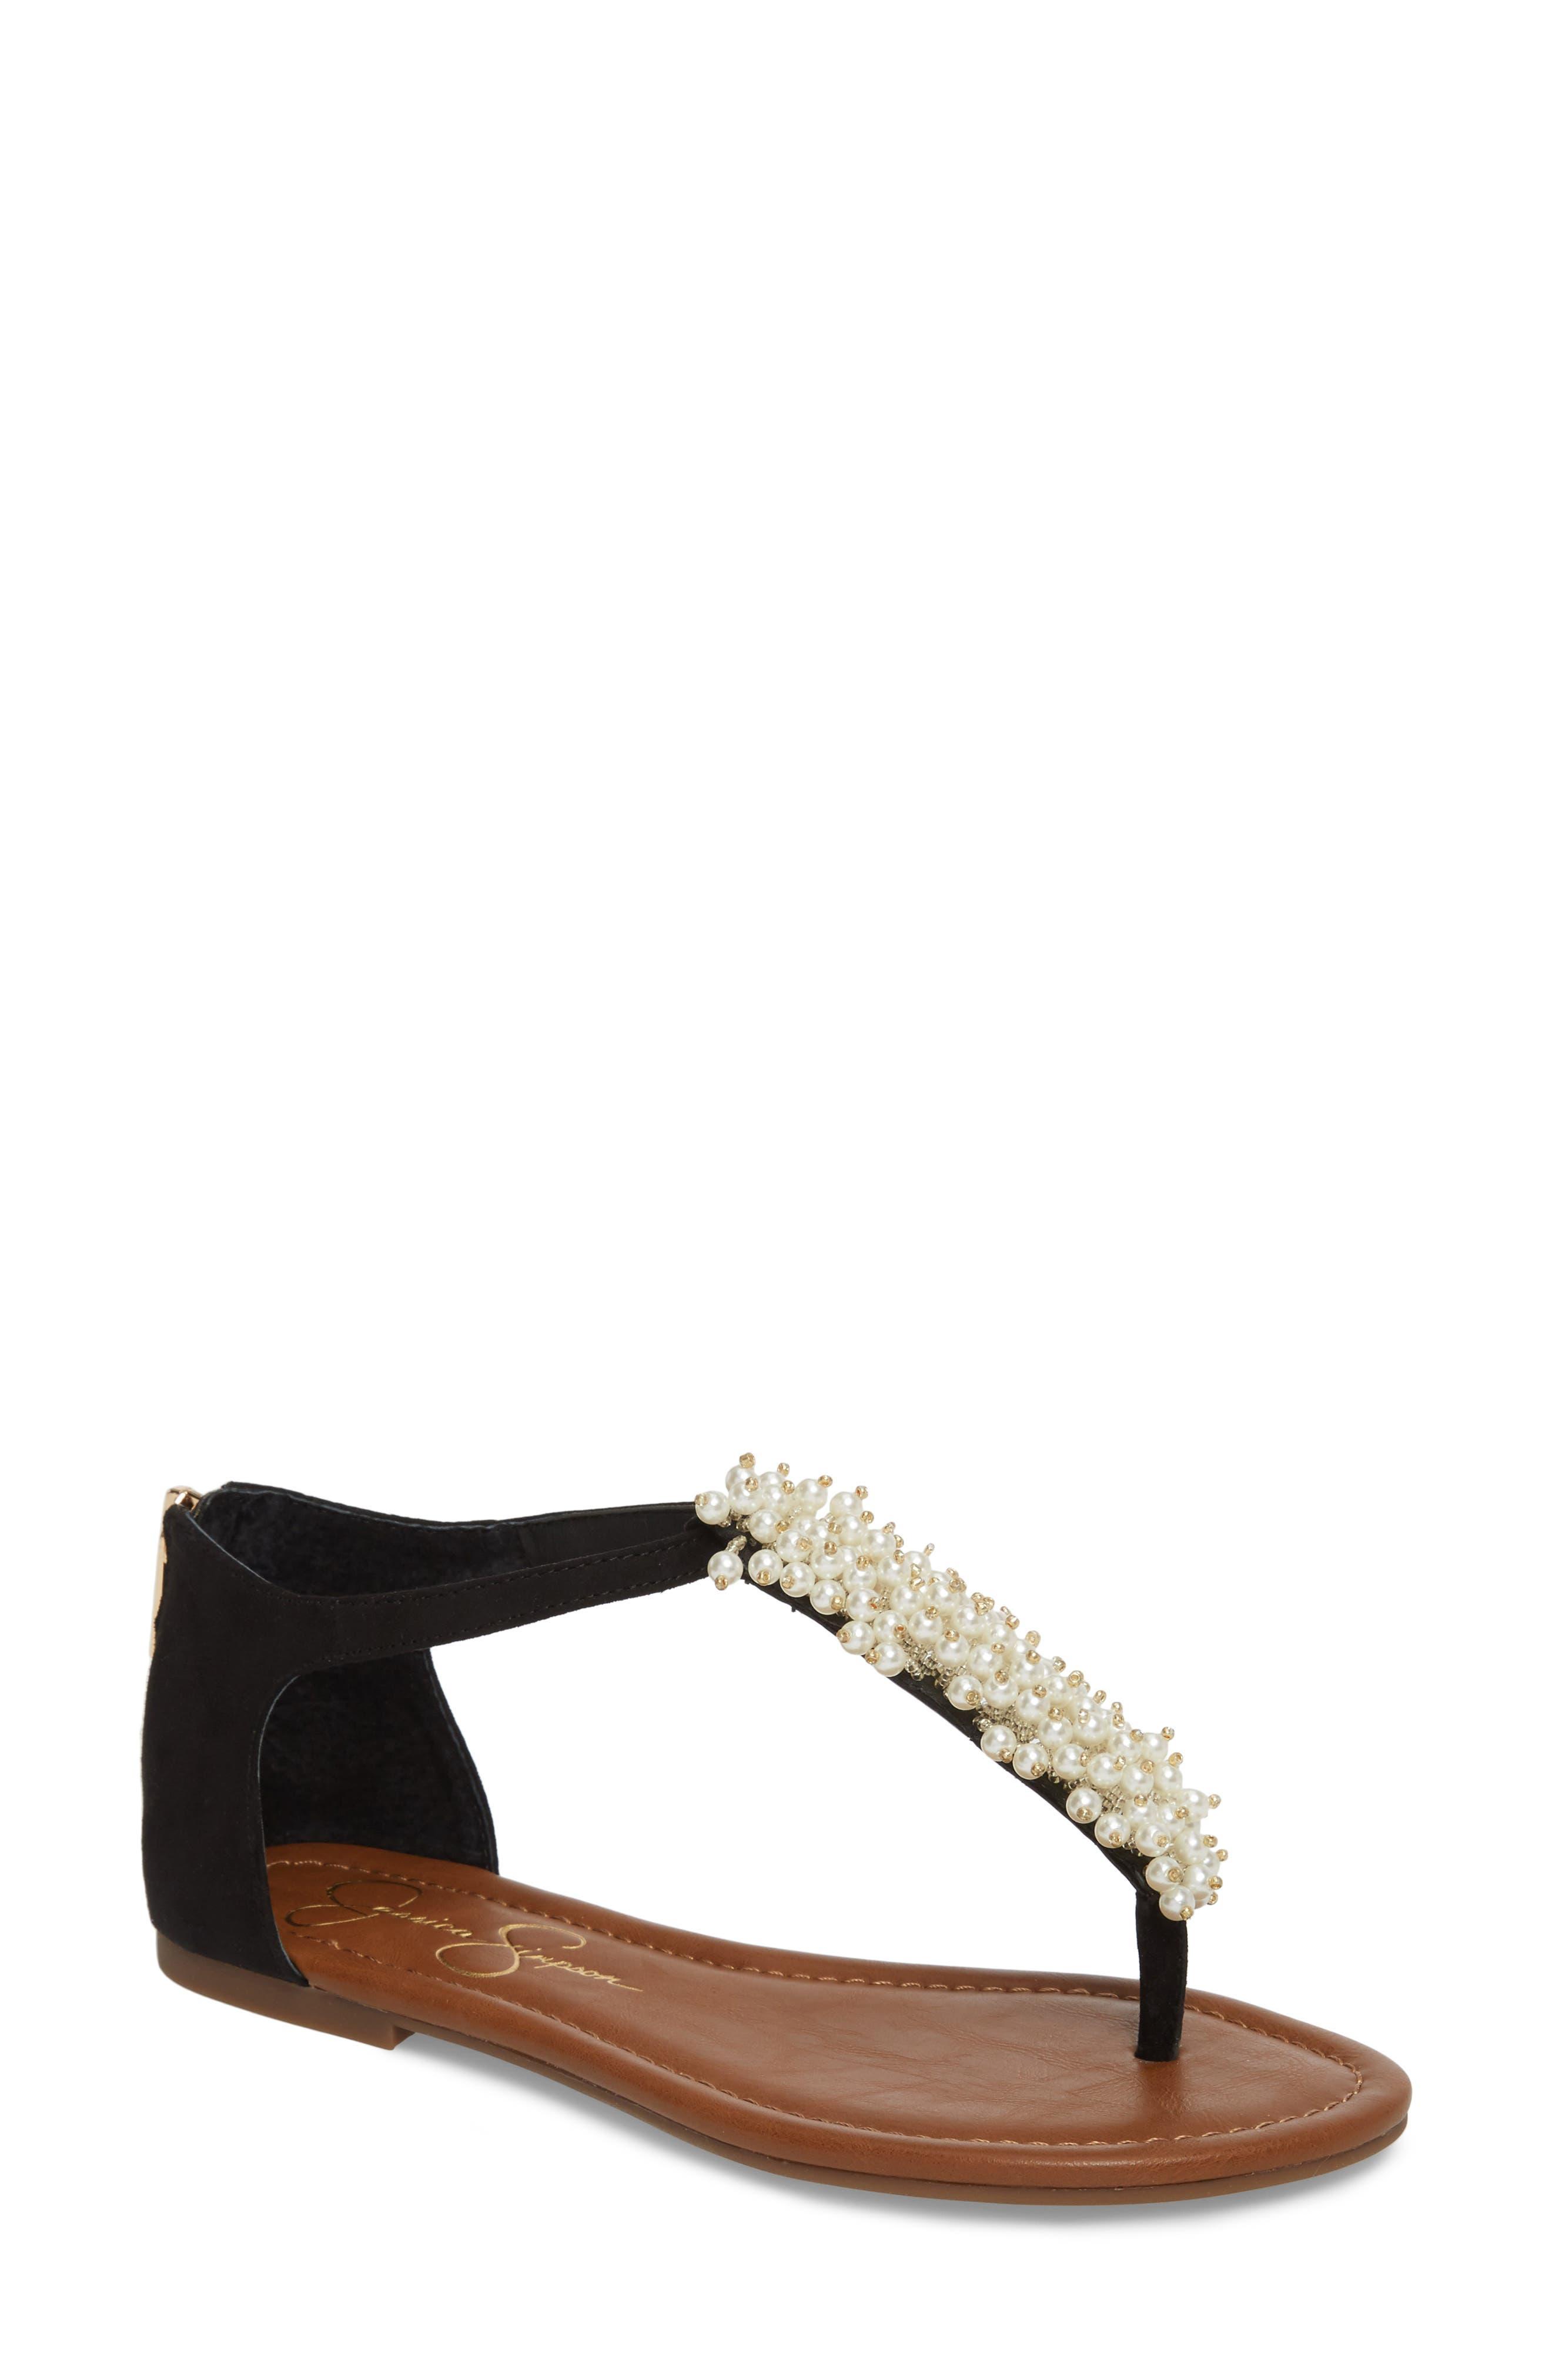 Main Image - Jessica Simpson Kenton Crystal Embellished Sandal (Women)